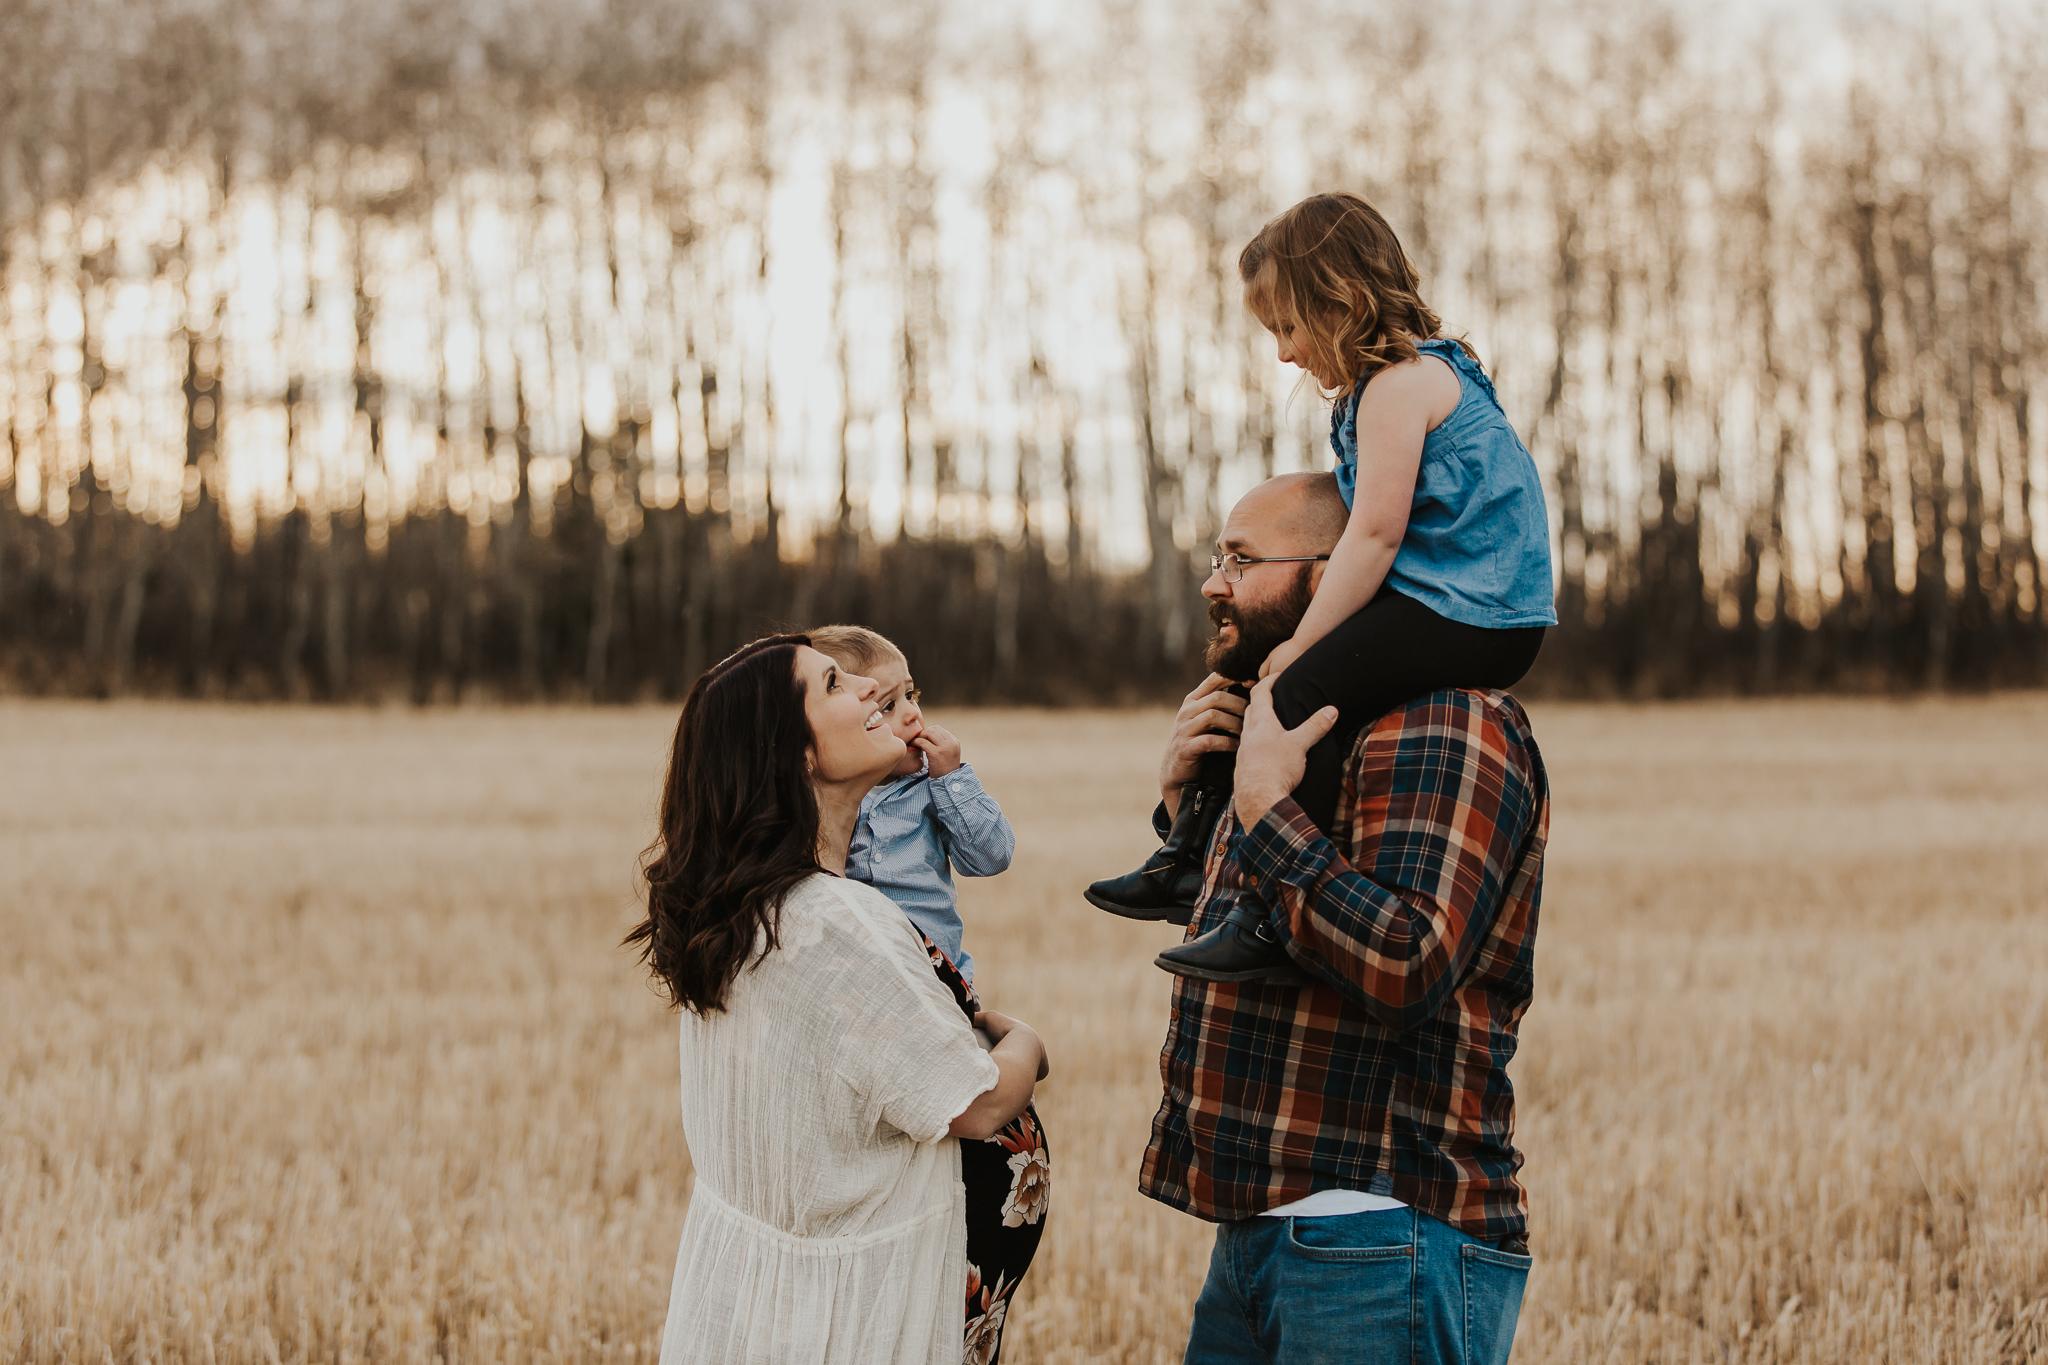 Alina-Joy-Photography-Cold-Lake-Maternity-Photographer-Josee-14.jpg